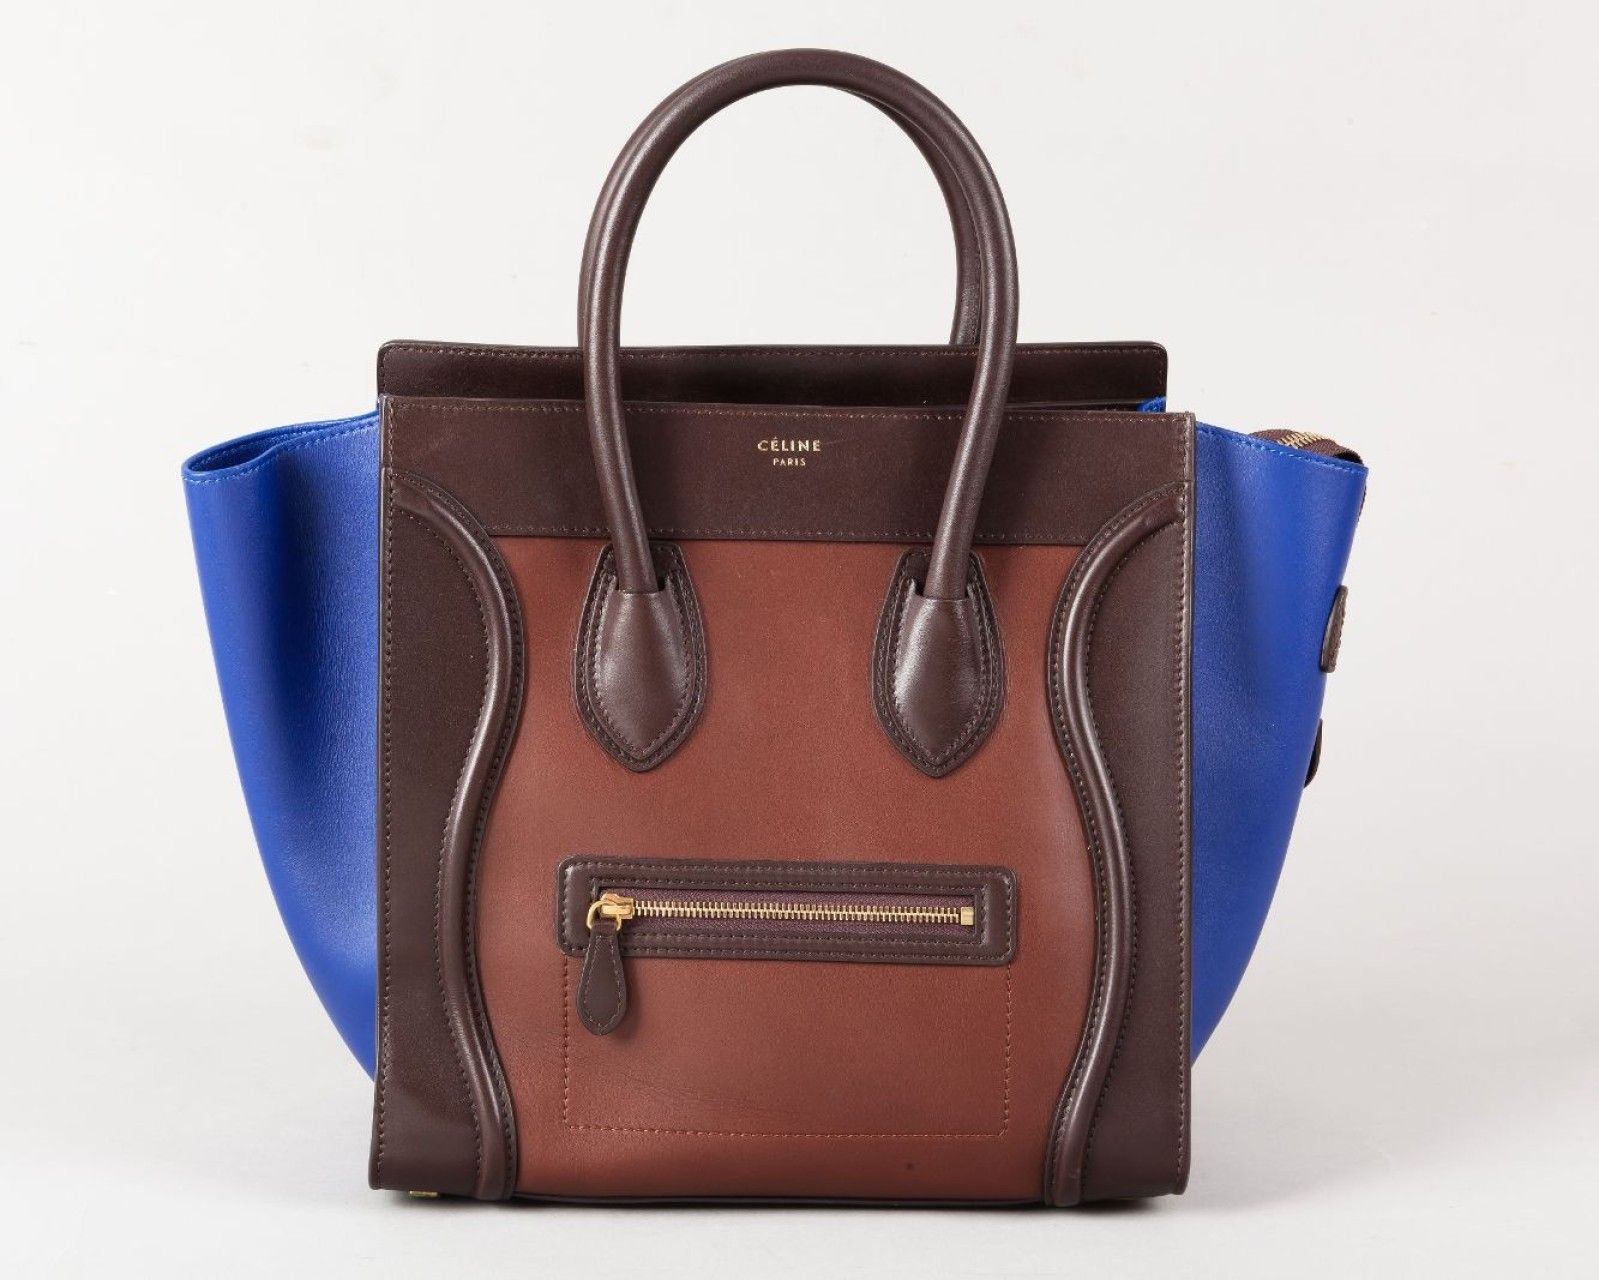 celine sac luggage 31cm en cuir tricolore bleu roi. Black Bedroom Furniture Sets. Home Design Ideas